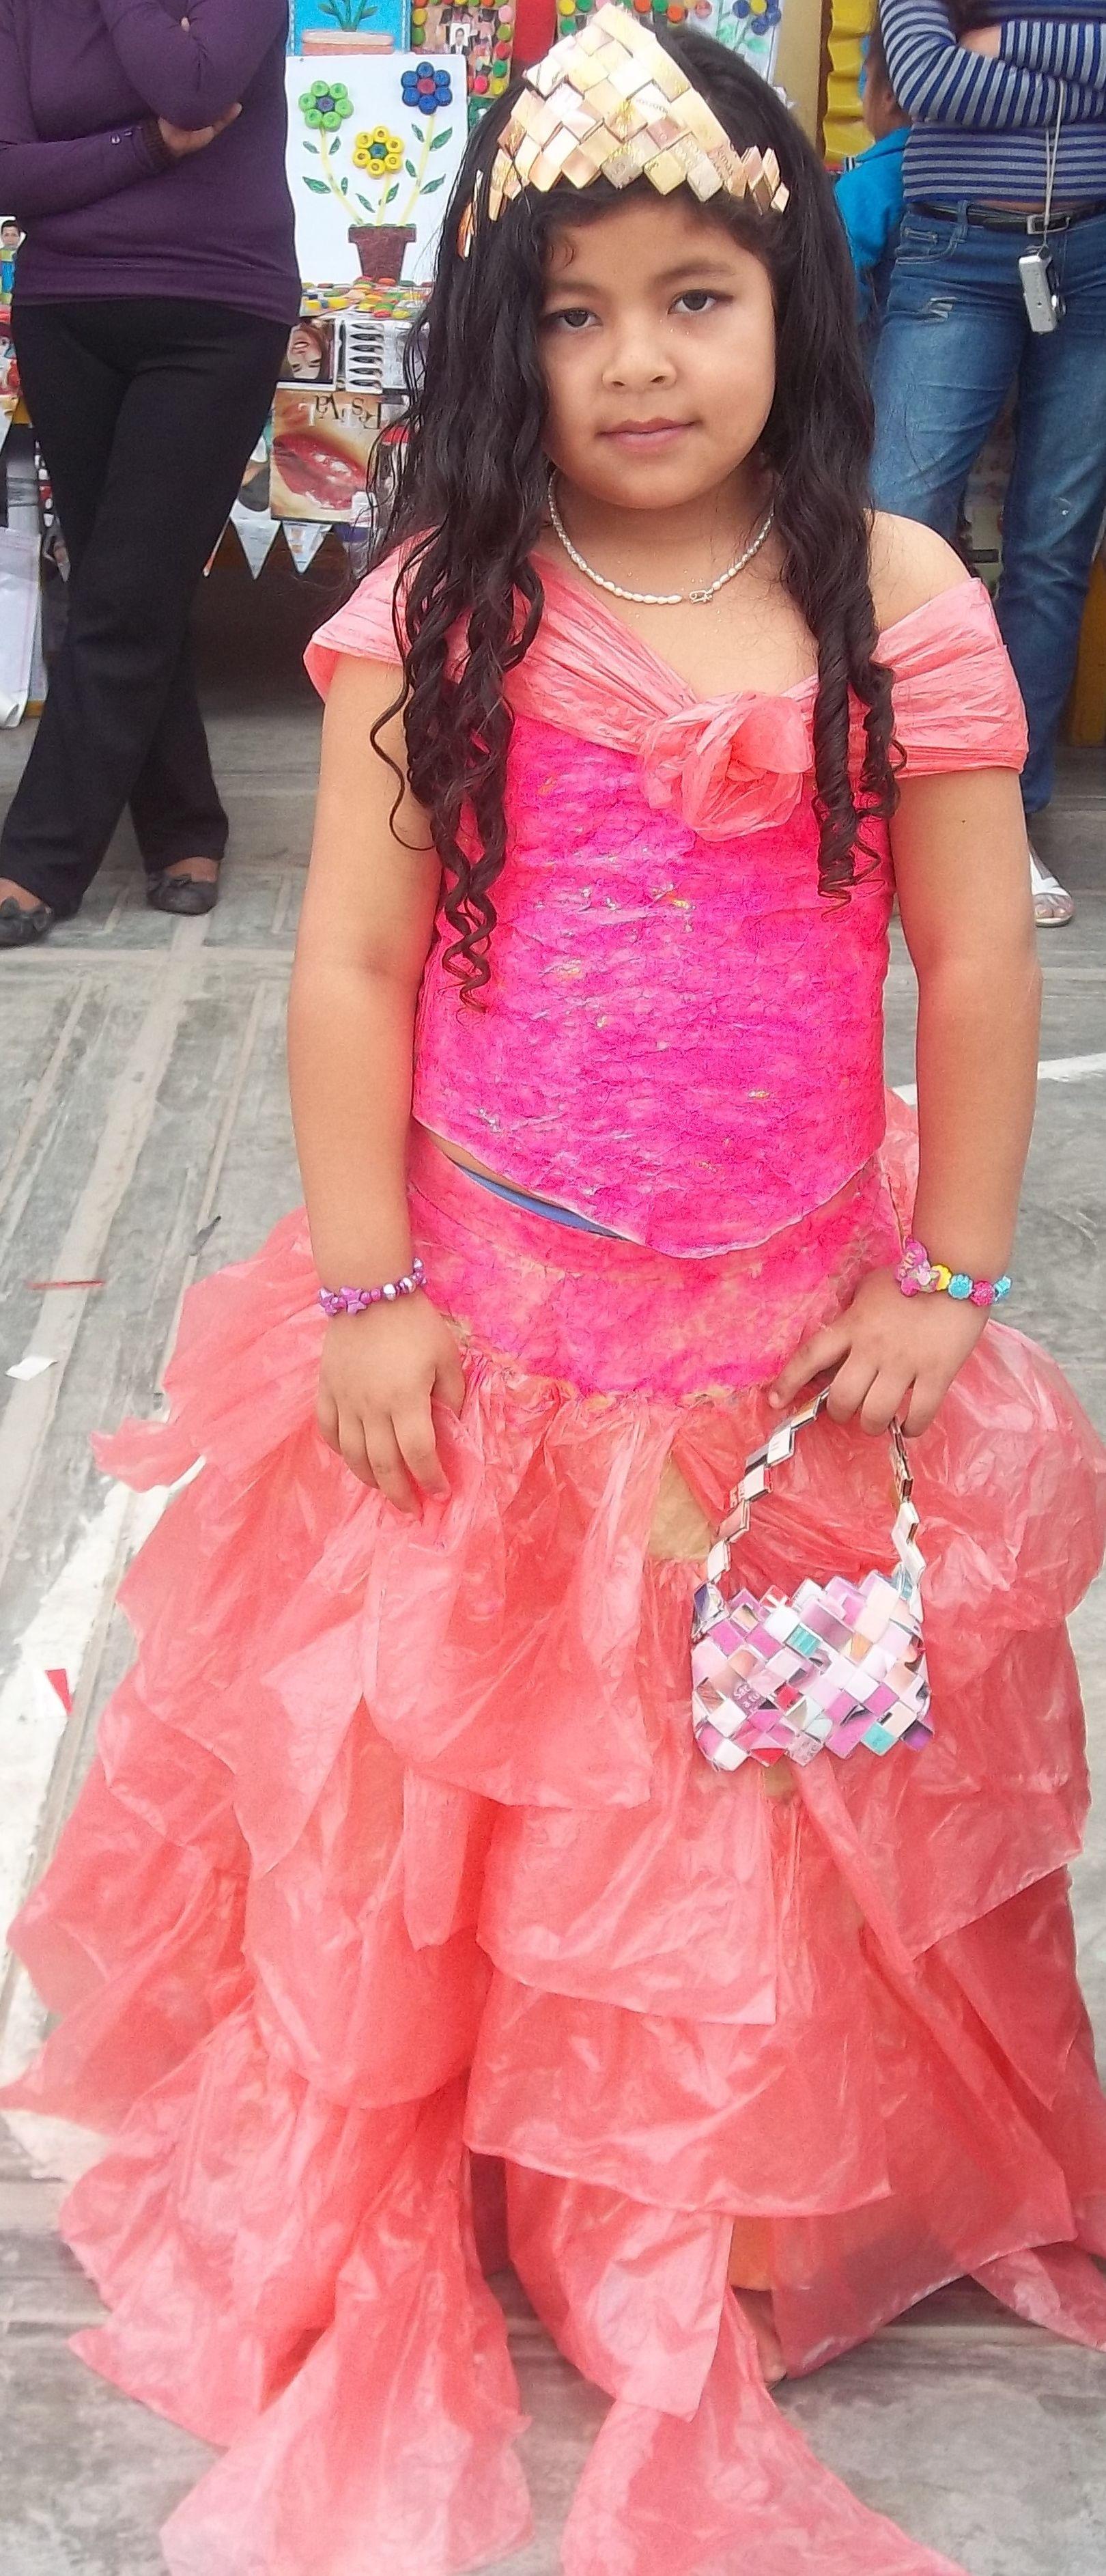 Vestido reciclaje para niña | catrina | Pinterest | Reciclaje, Para ...